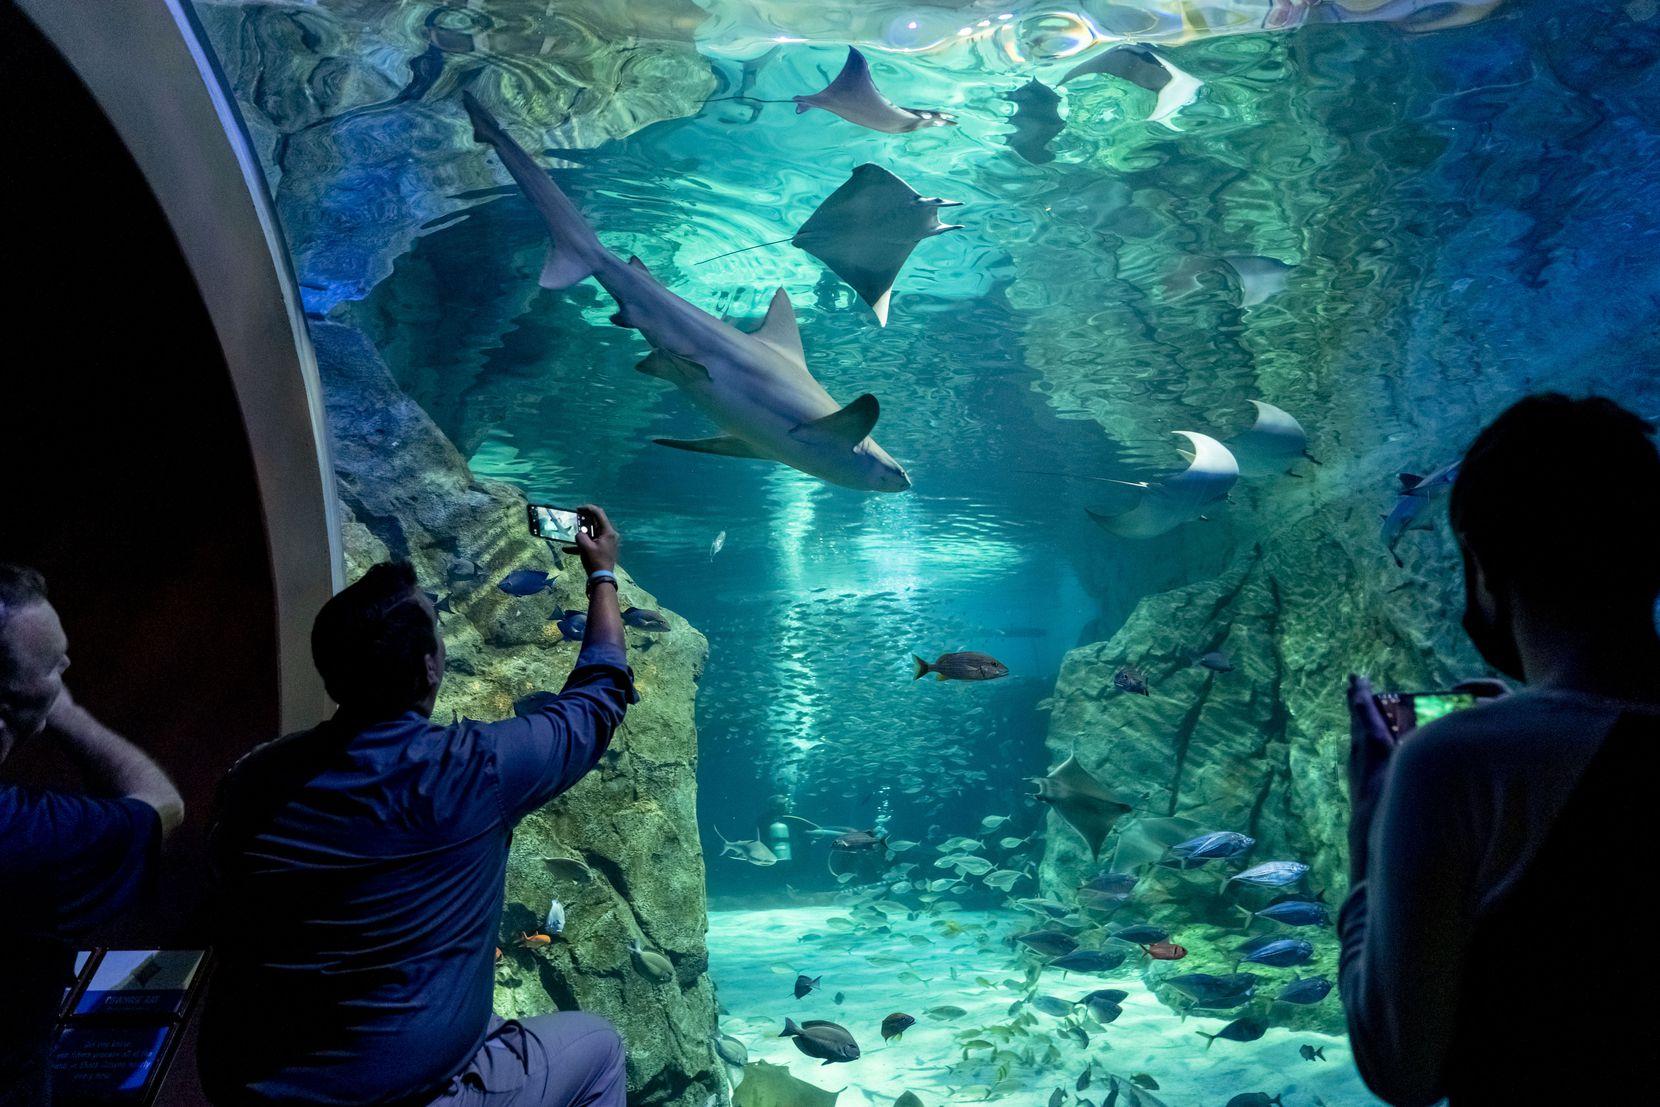 Dallas City Council member Adam Bazaldua views the shark canyon exhibit during a tour of St. Louis Aquarium at Union Station on Wednesday.